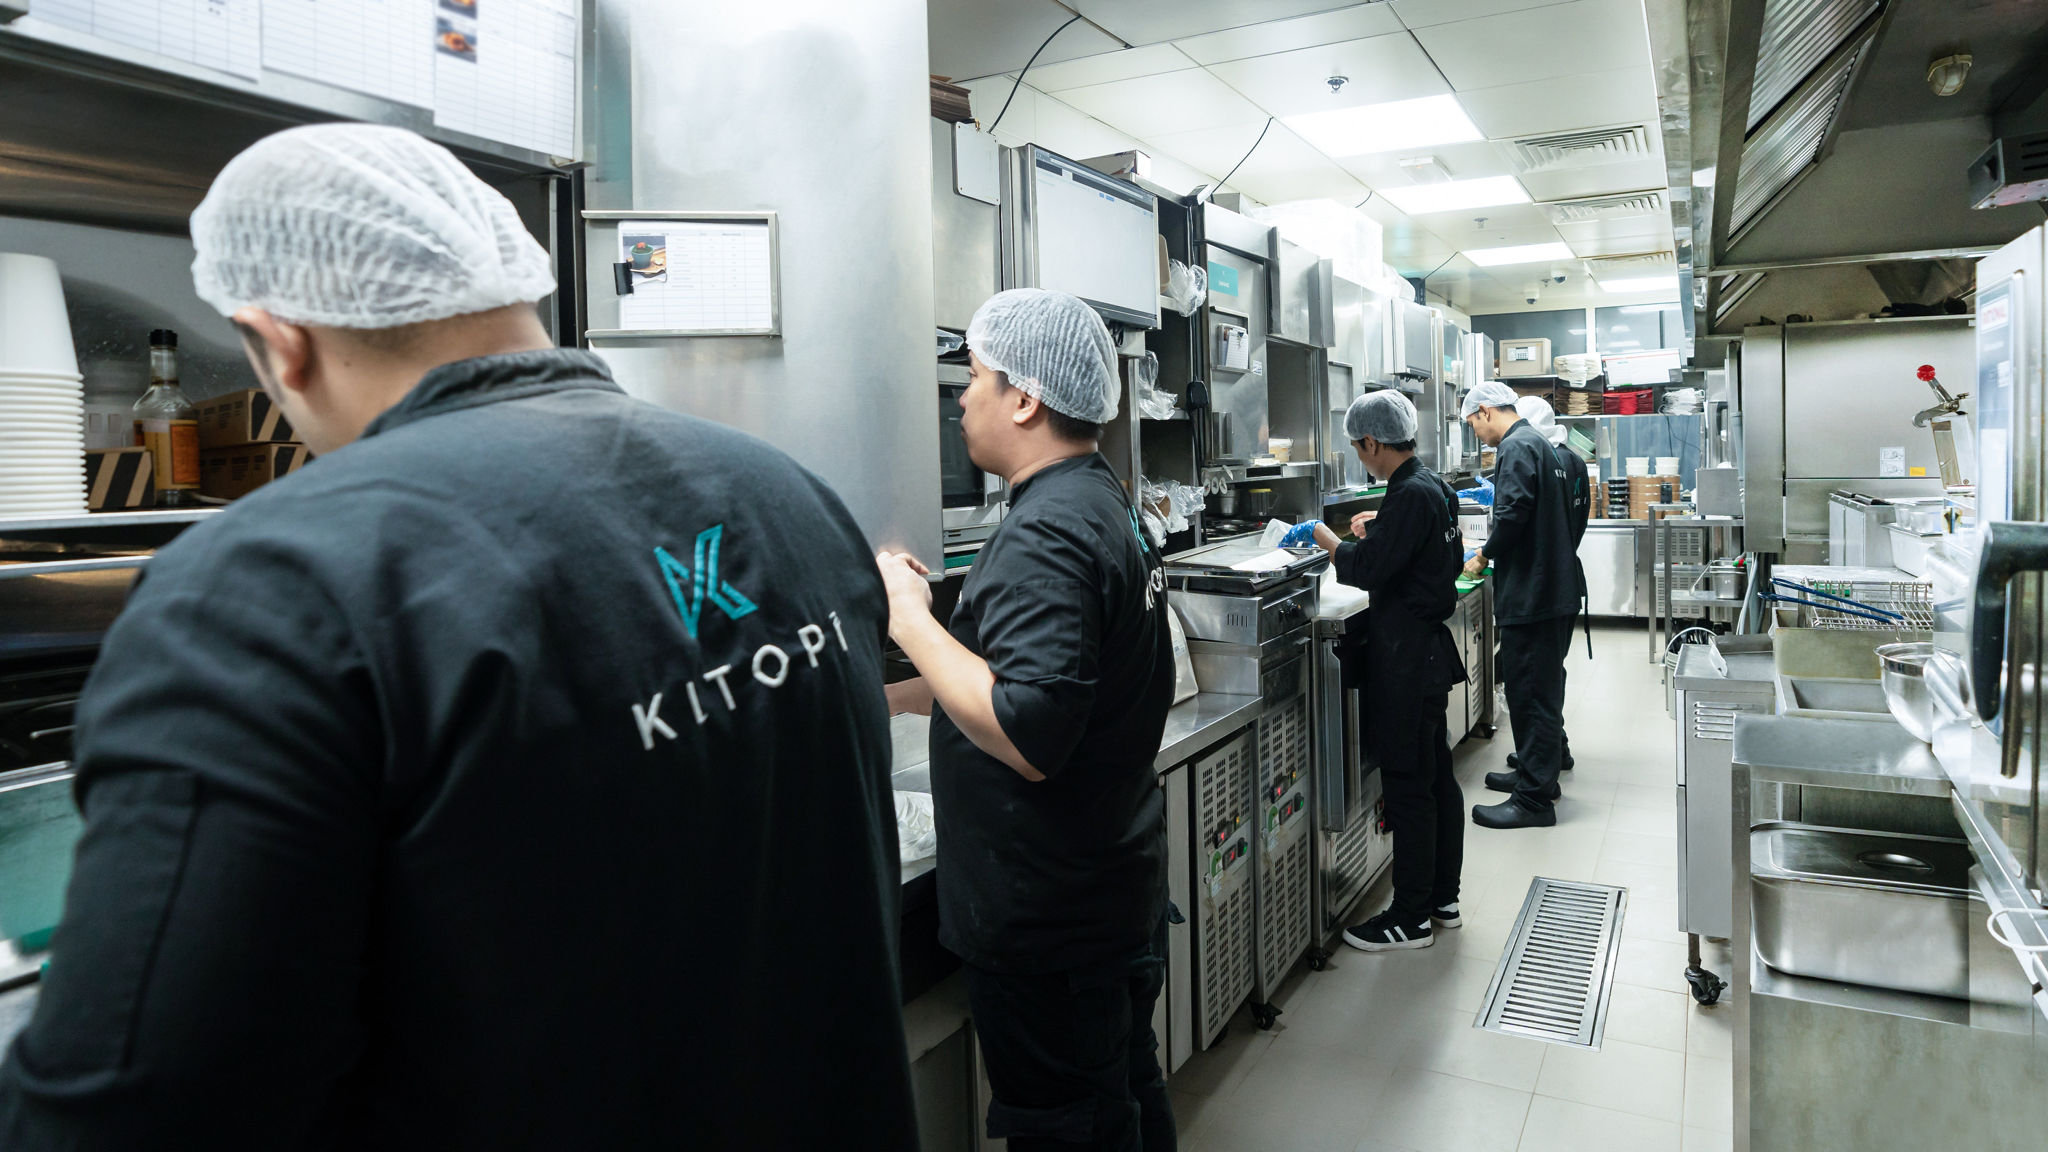 Kitopi Cloud Kitchen